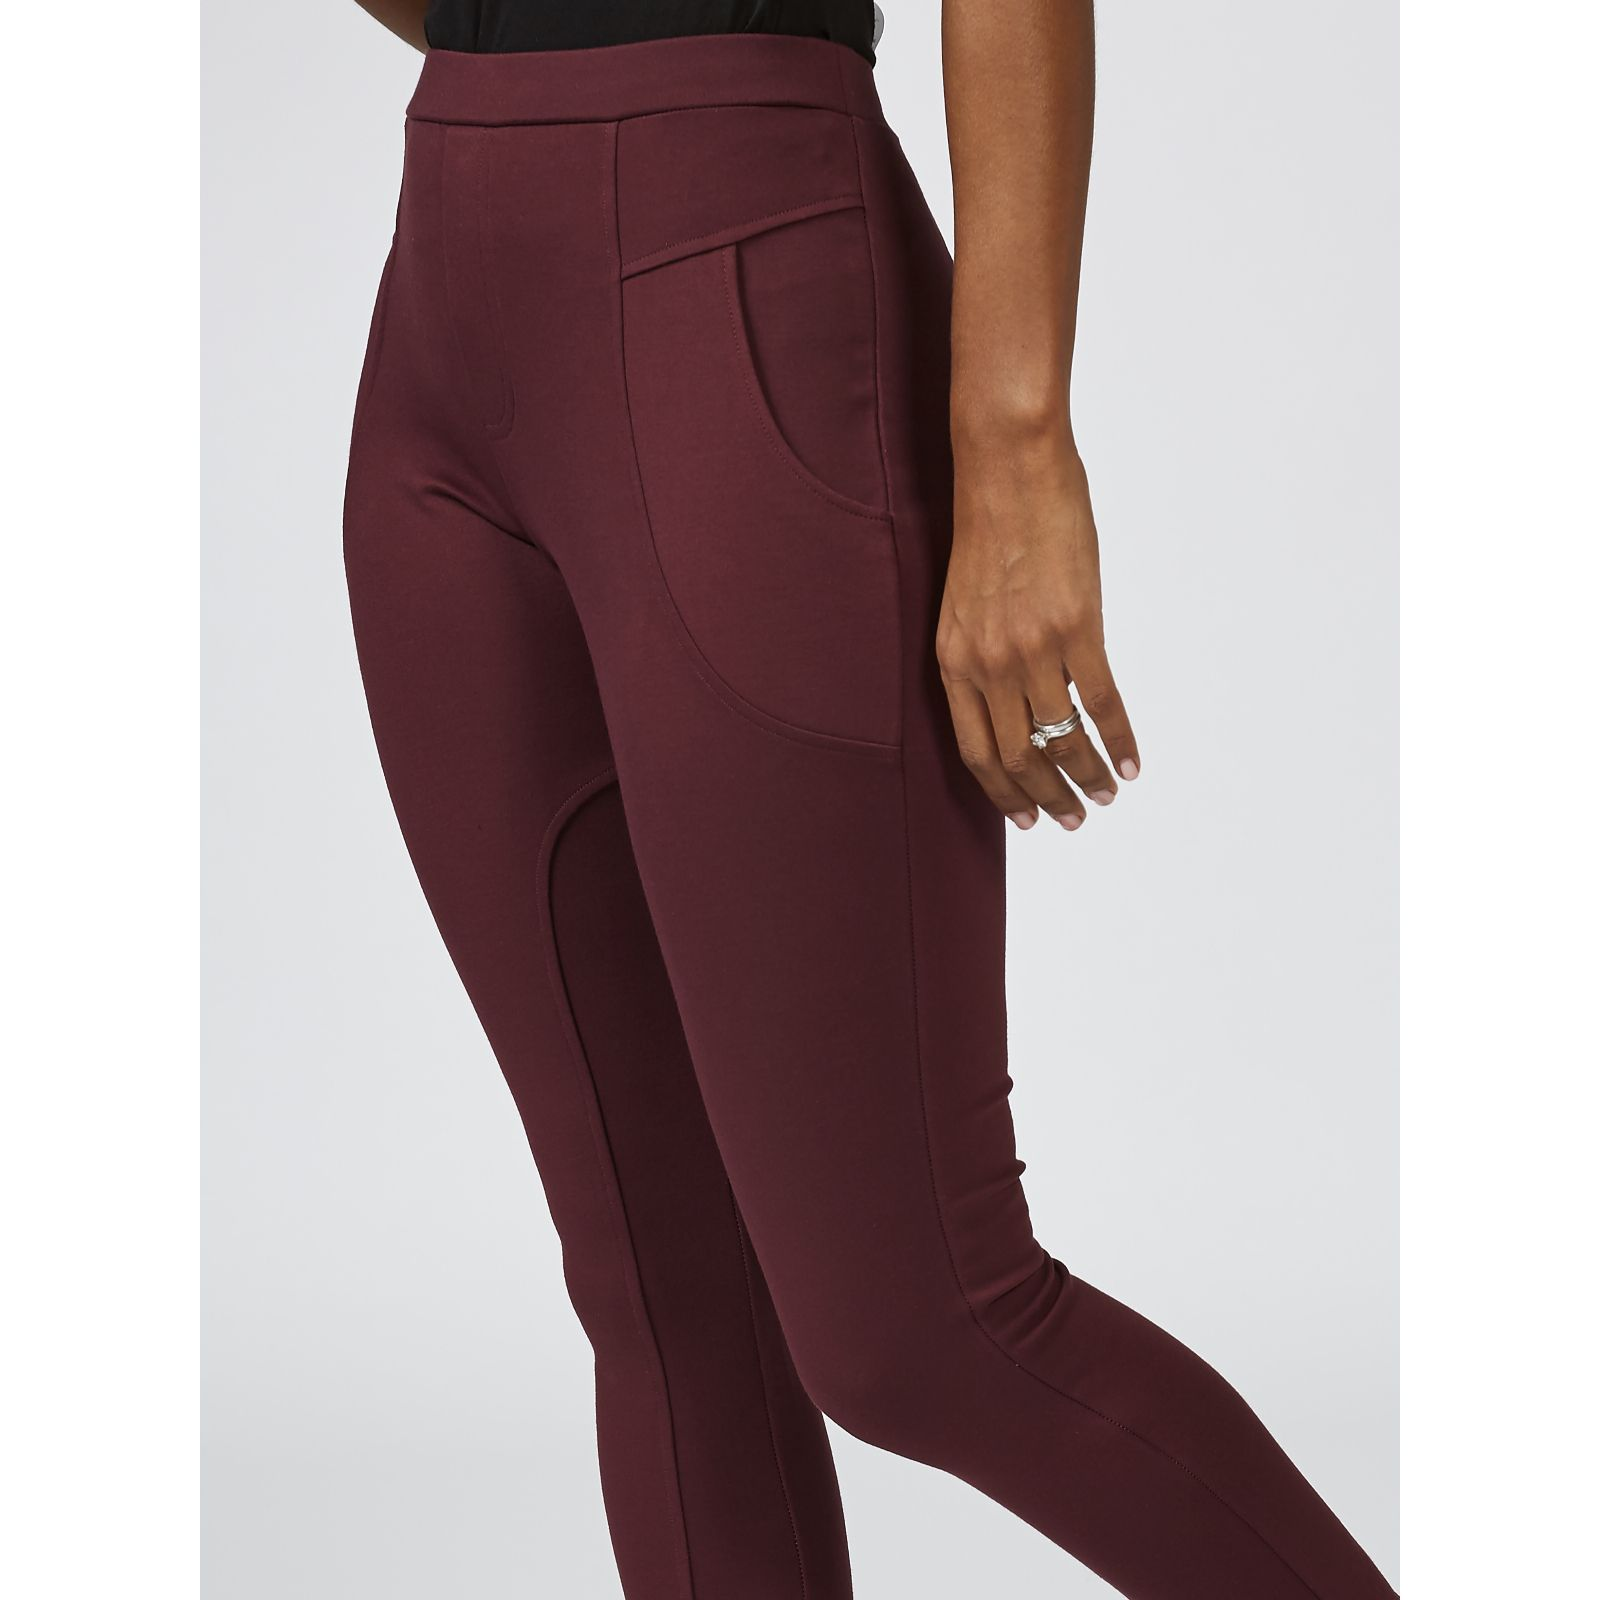 015c653cad05d Du Jour Pull On Ponte Knit Leggings with Pockets - QVC UK